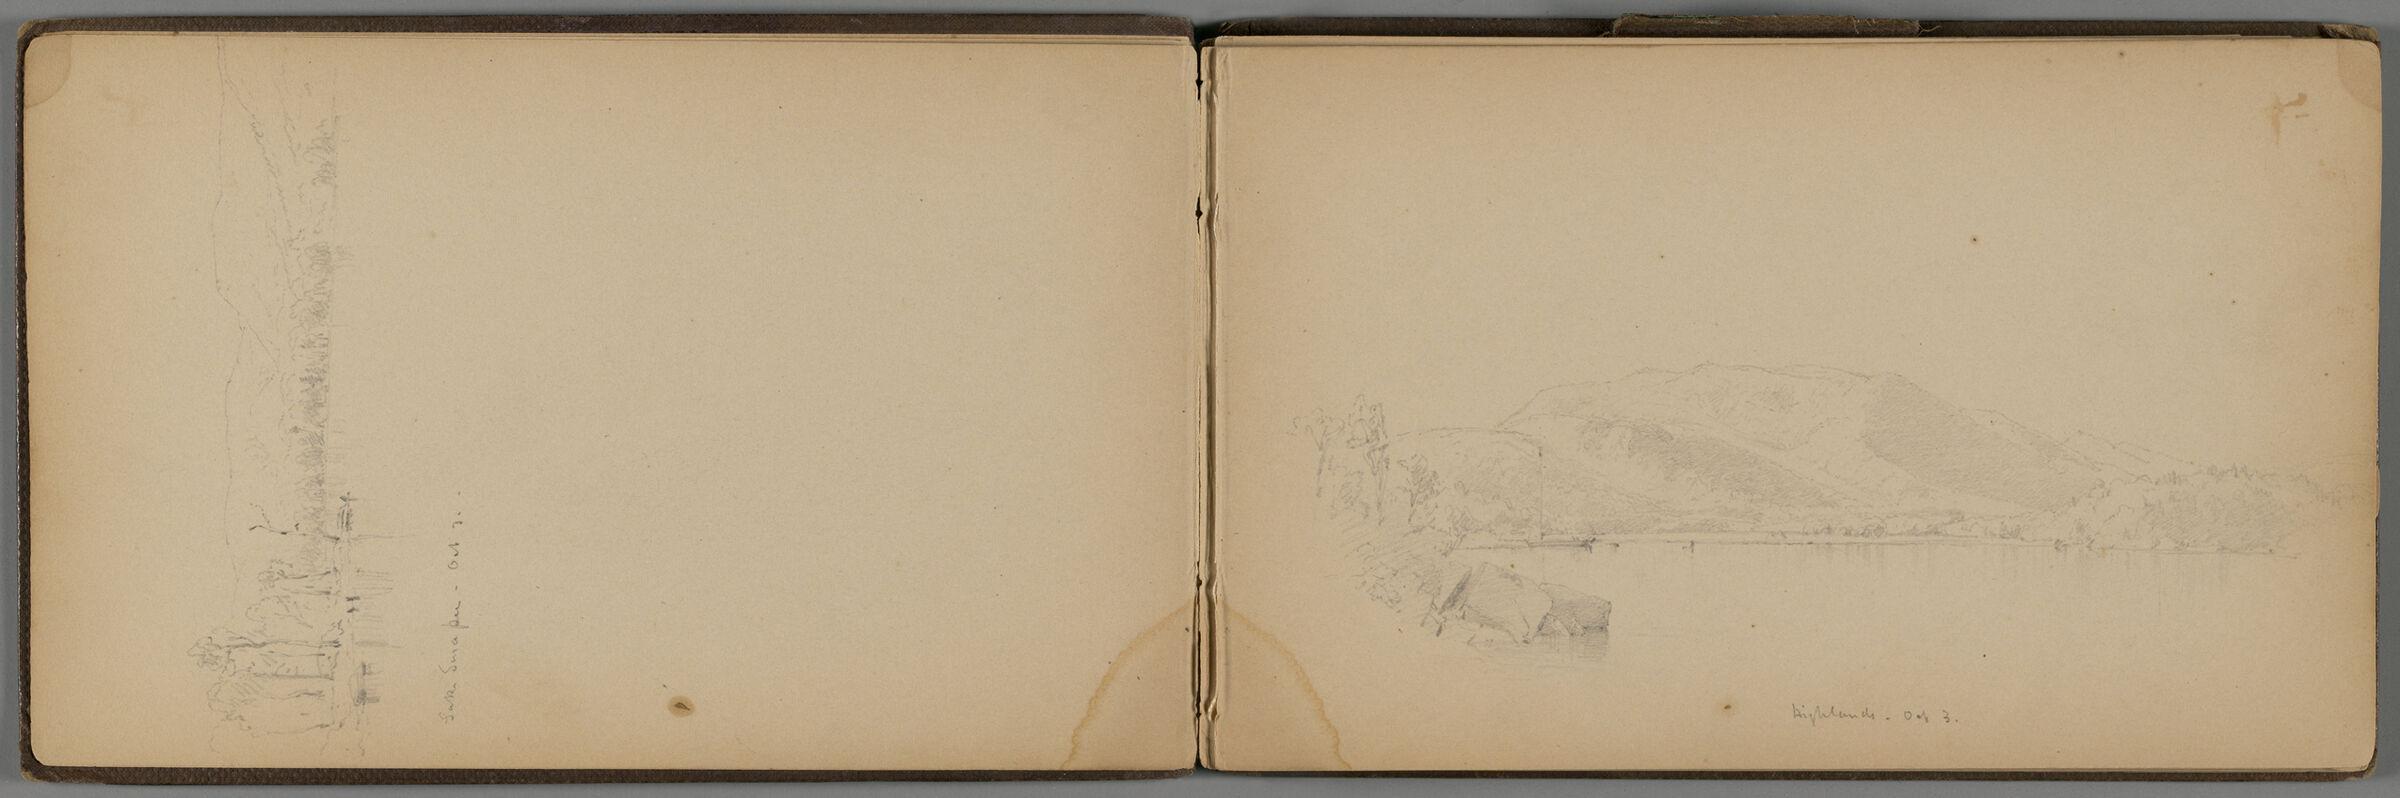 New Hampshire Highlands; Verso: Landscape